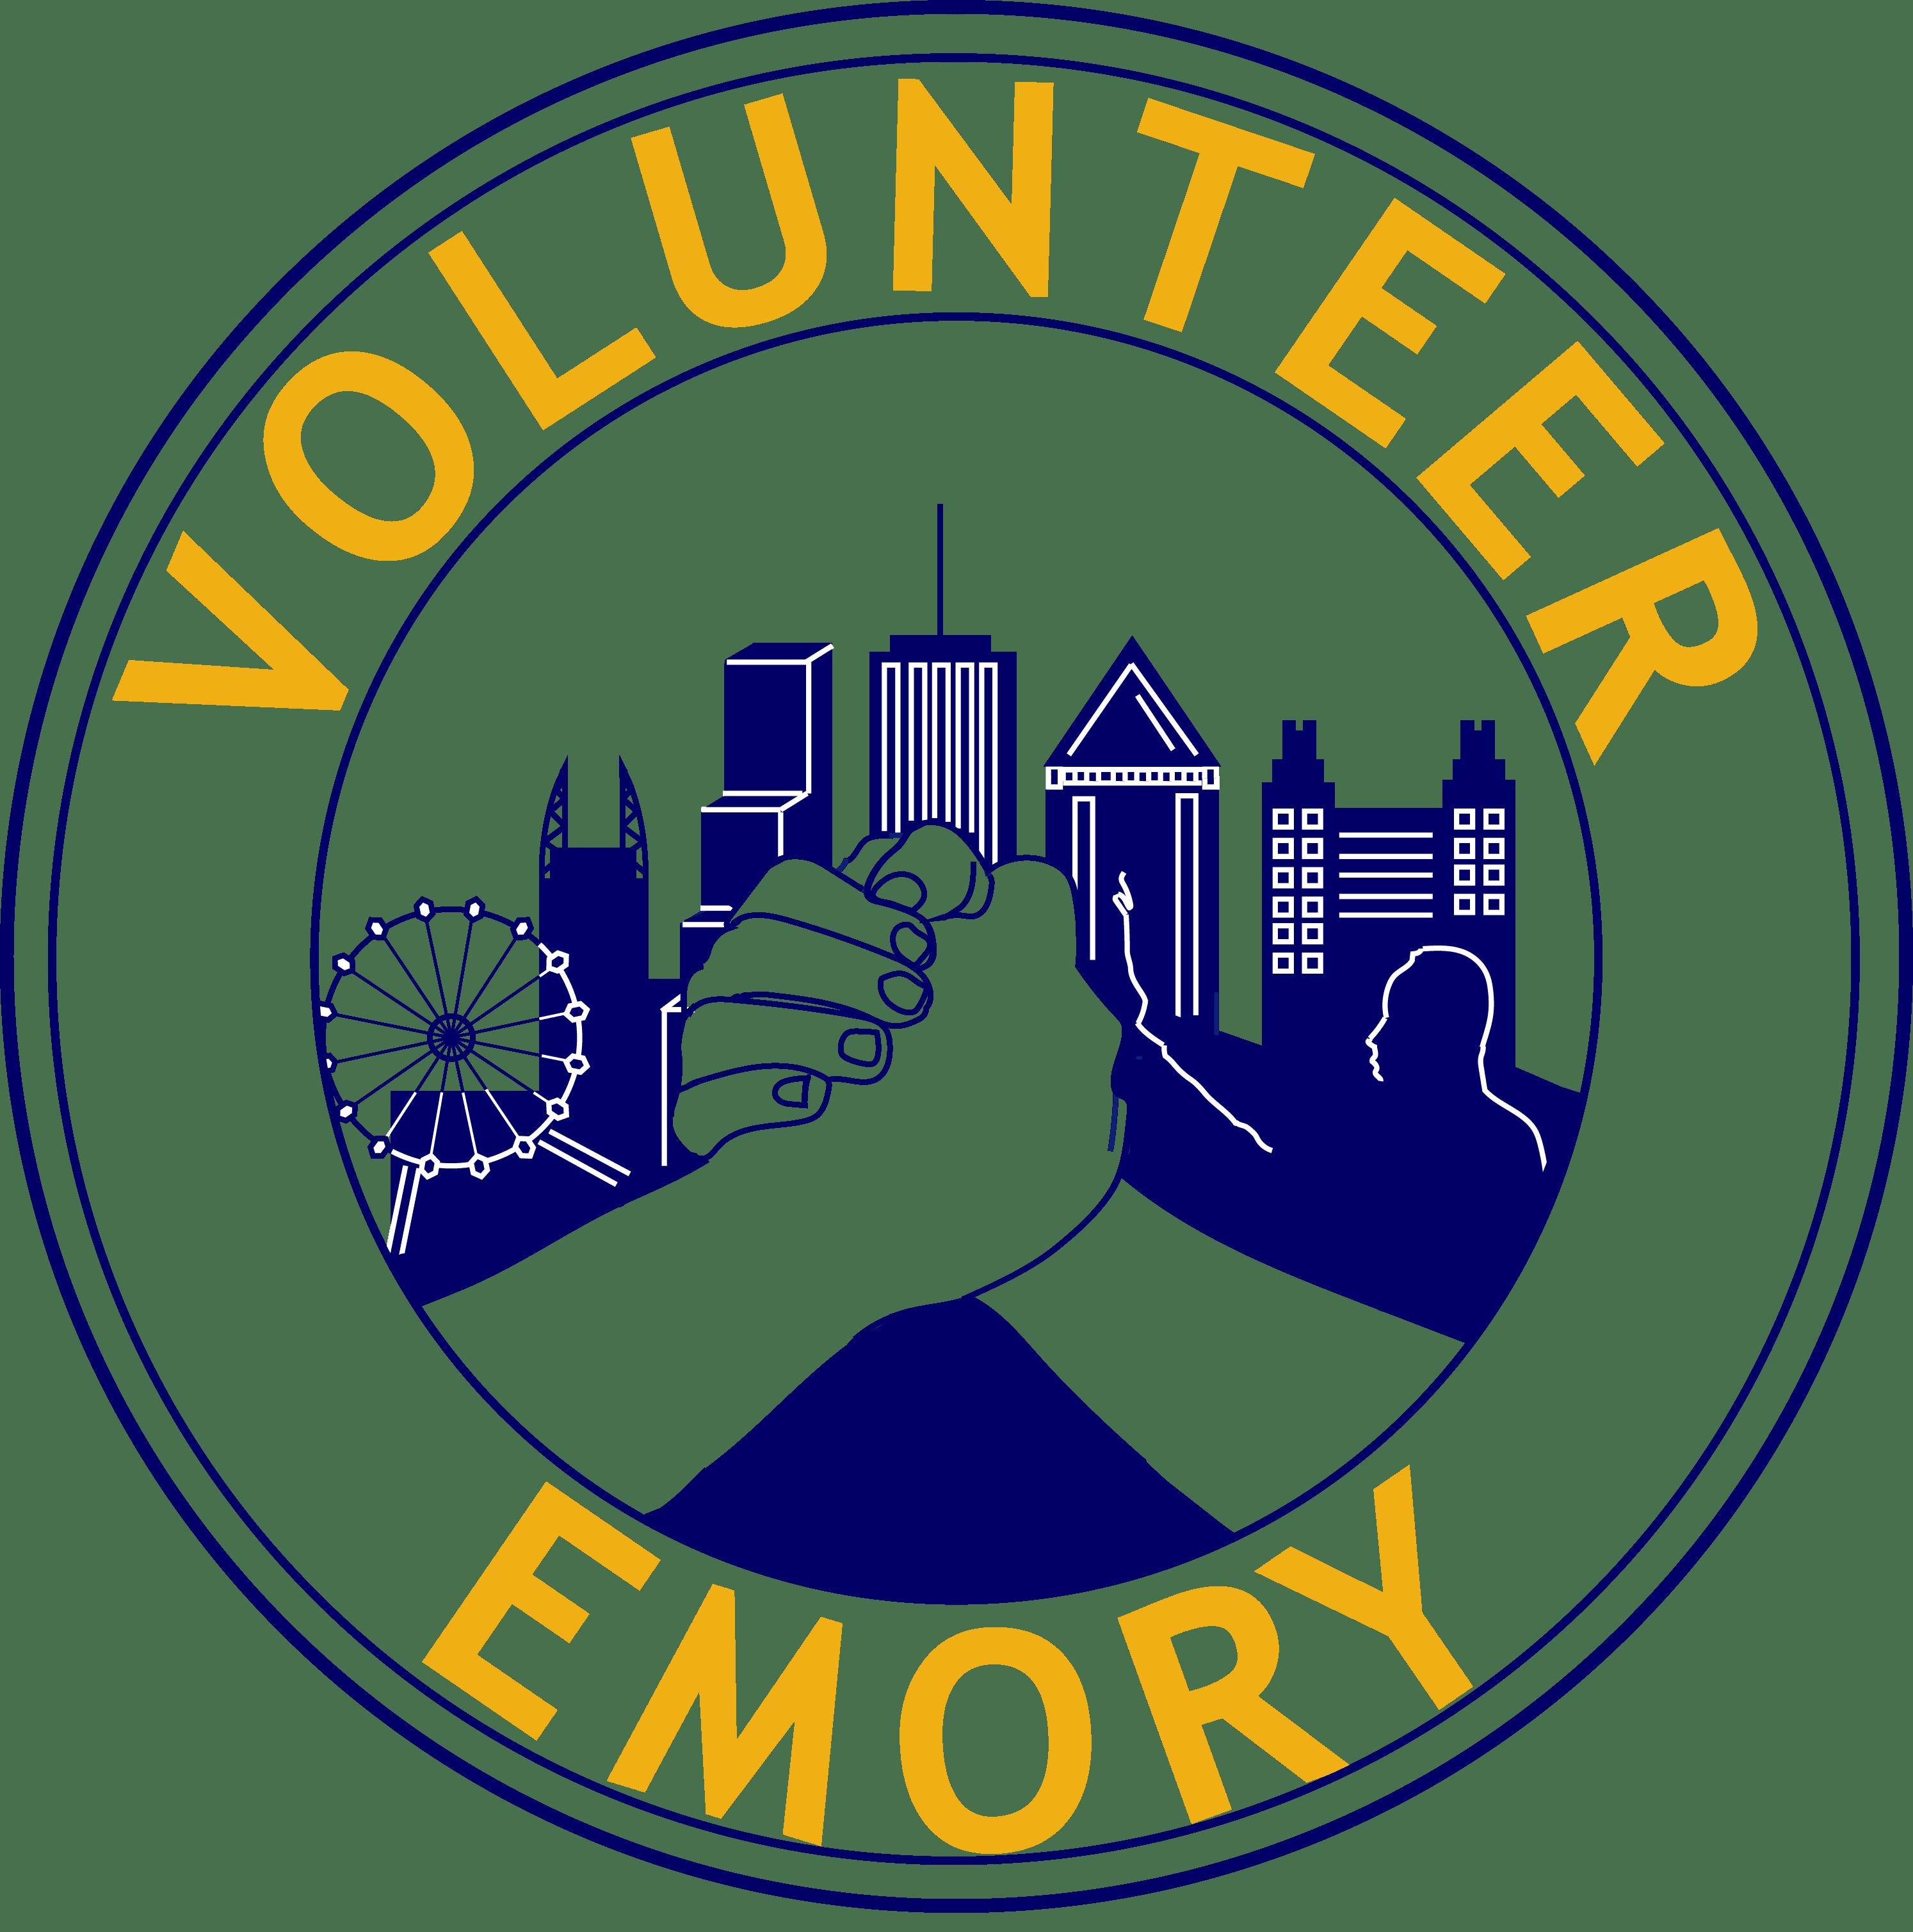 Volunteer Emory logo